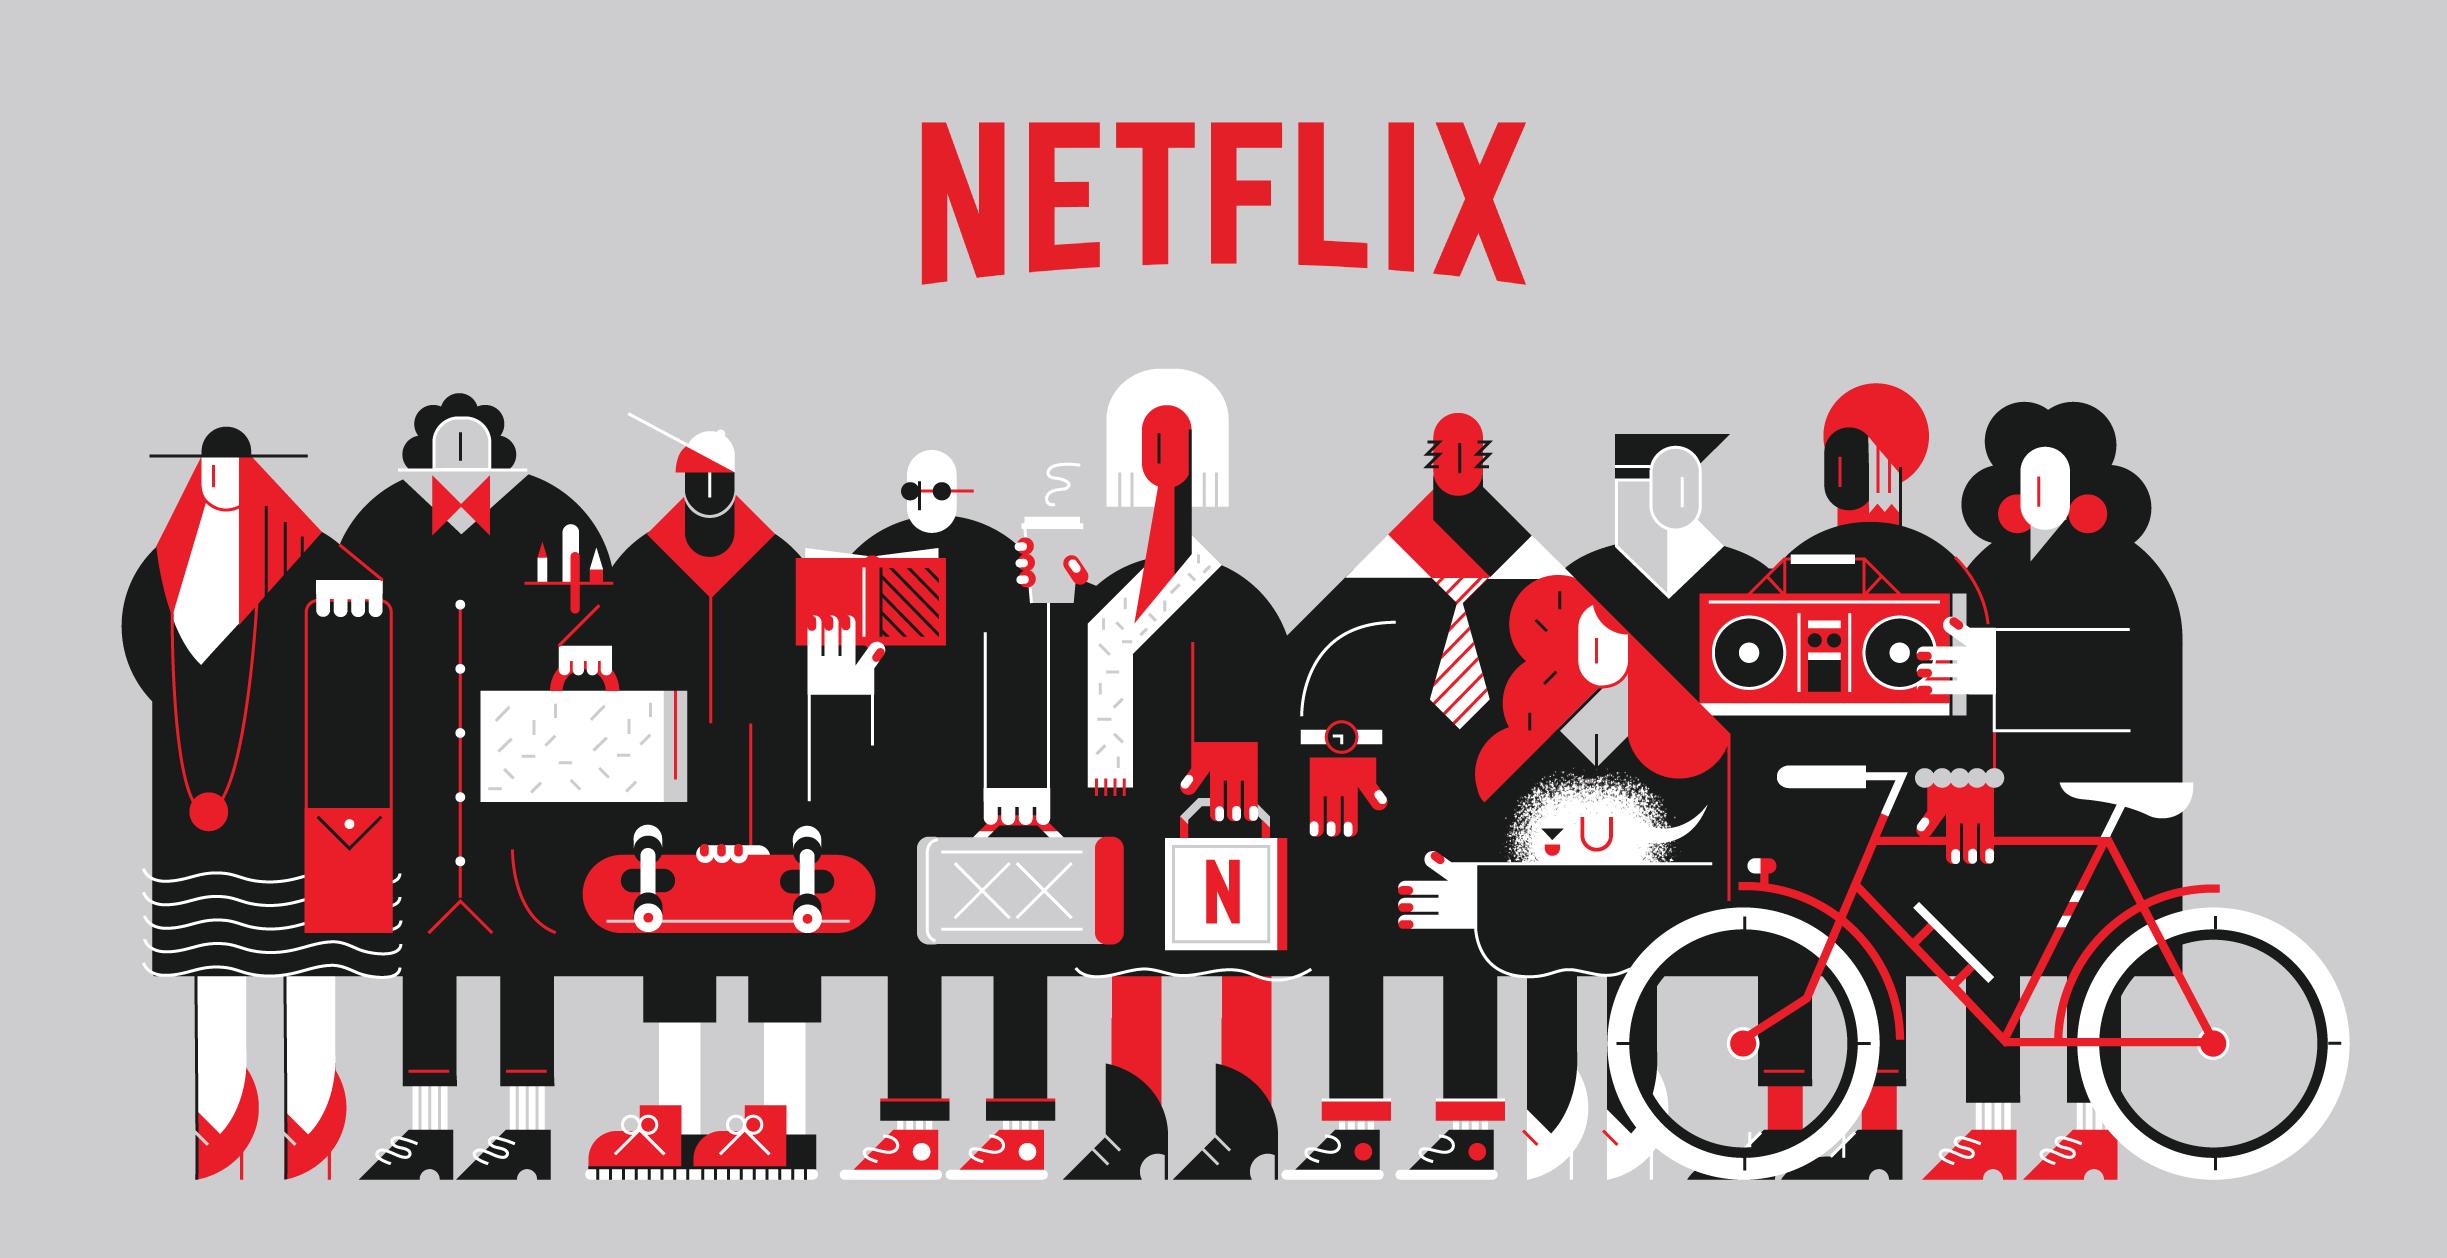 Netflix_Title.png